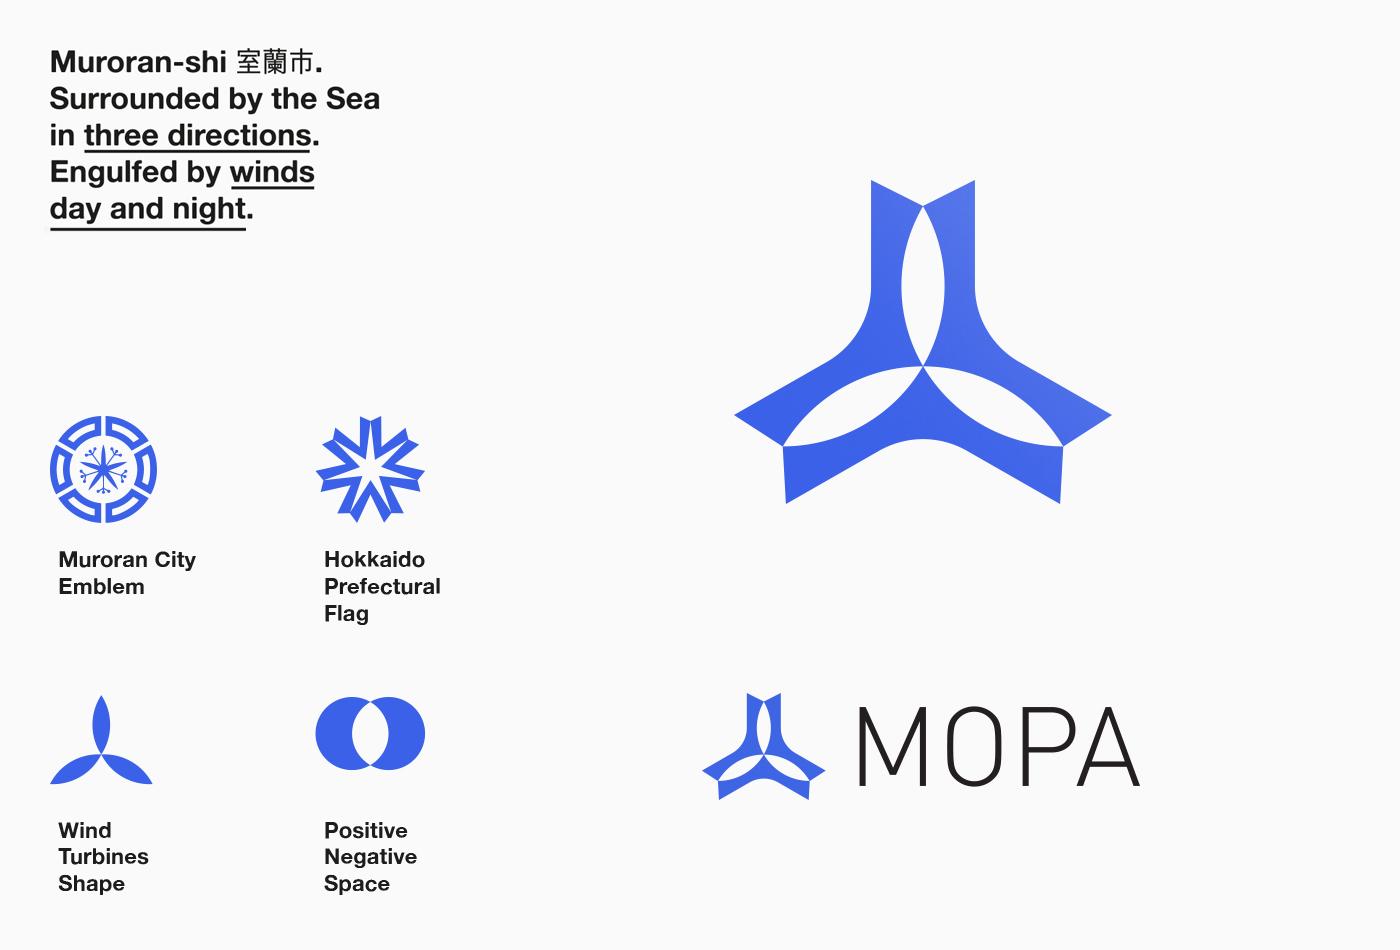 mopa-logo-vacaliebres-hokkaido-japan-logo-construction